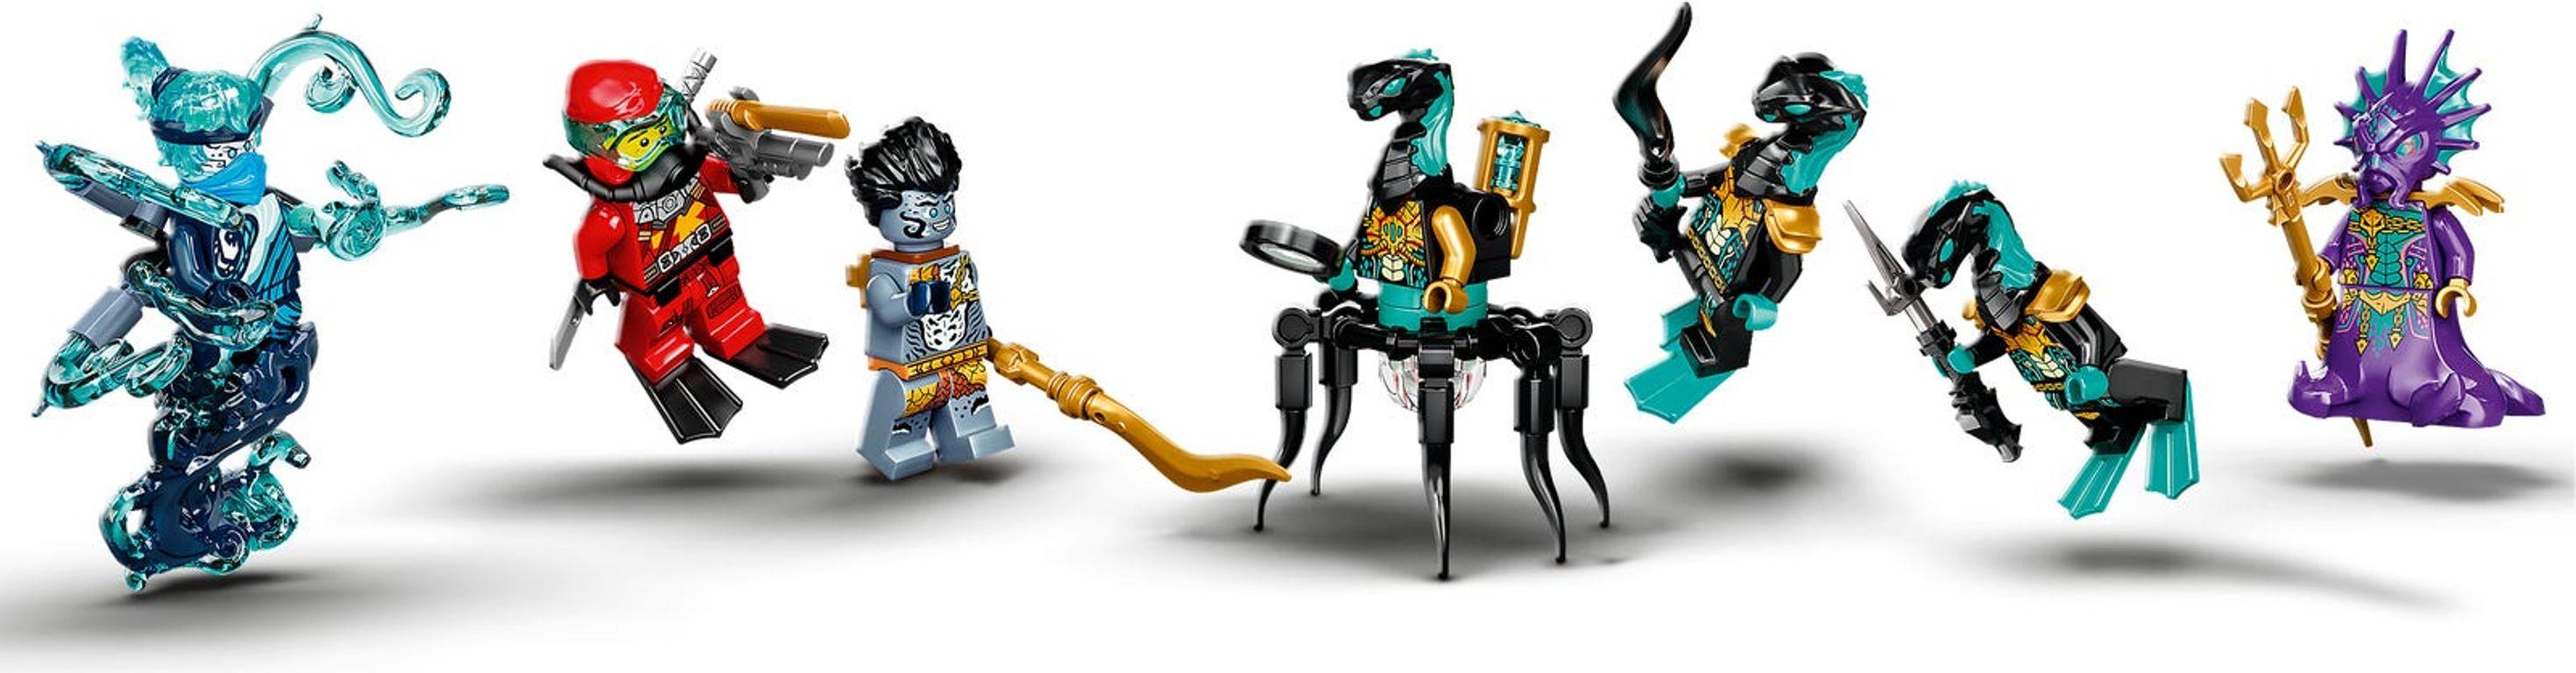 LEGO® Ninjago Temple of the Endless Sea minifigures